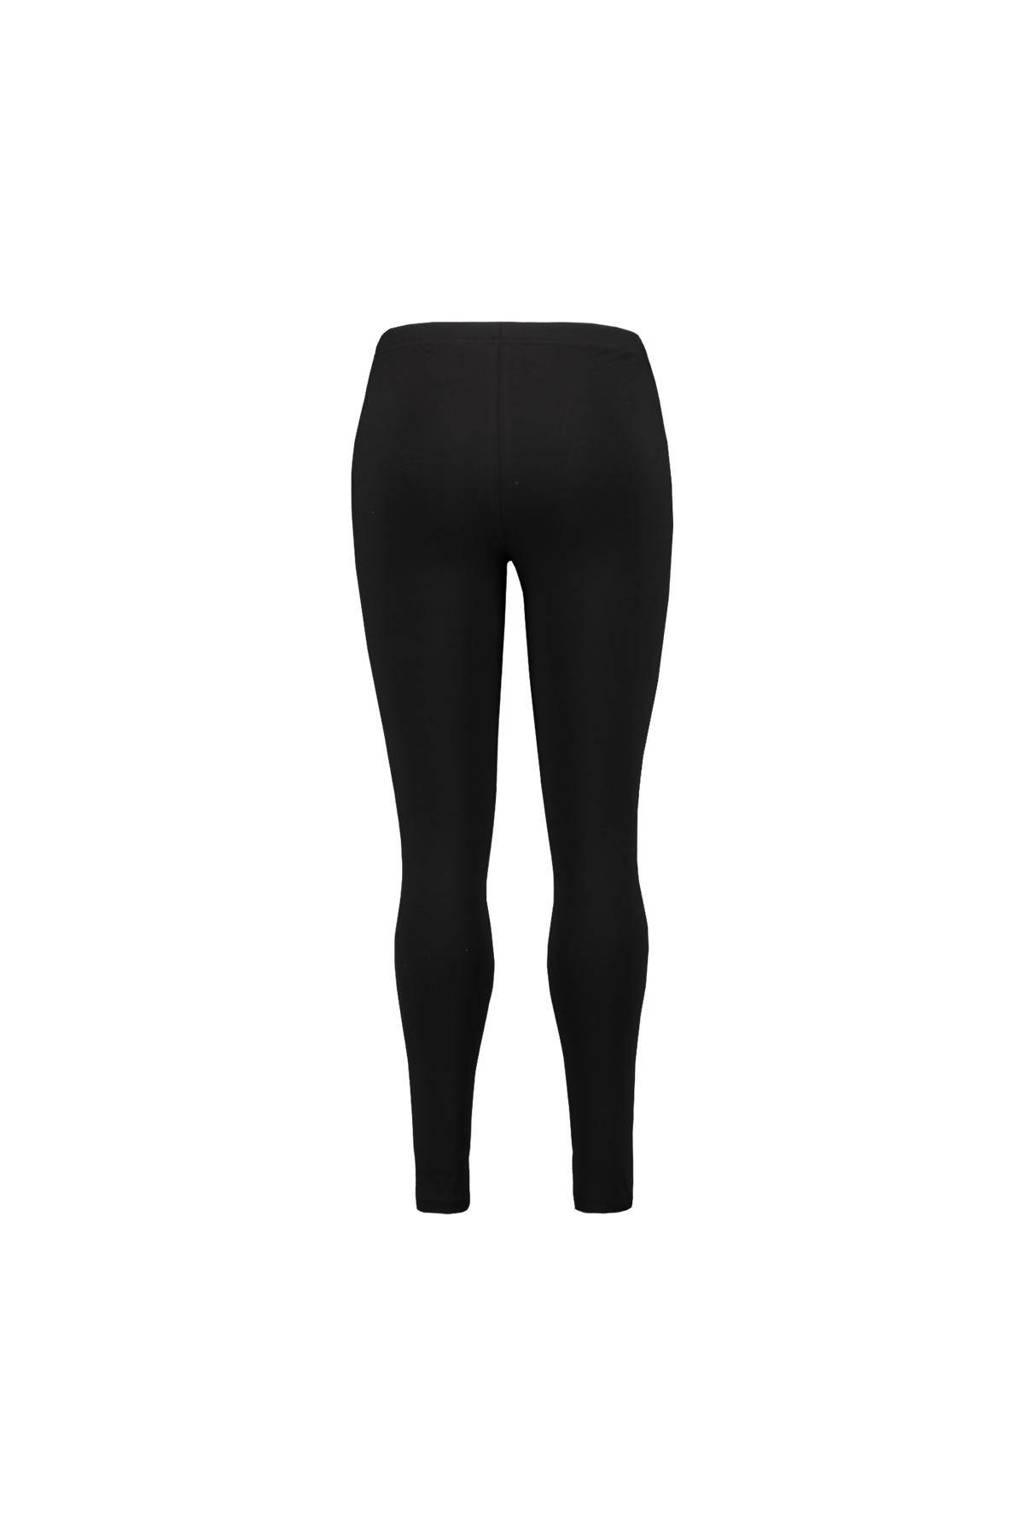 MS Mode legging - set van 2 zwart, Zwart